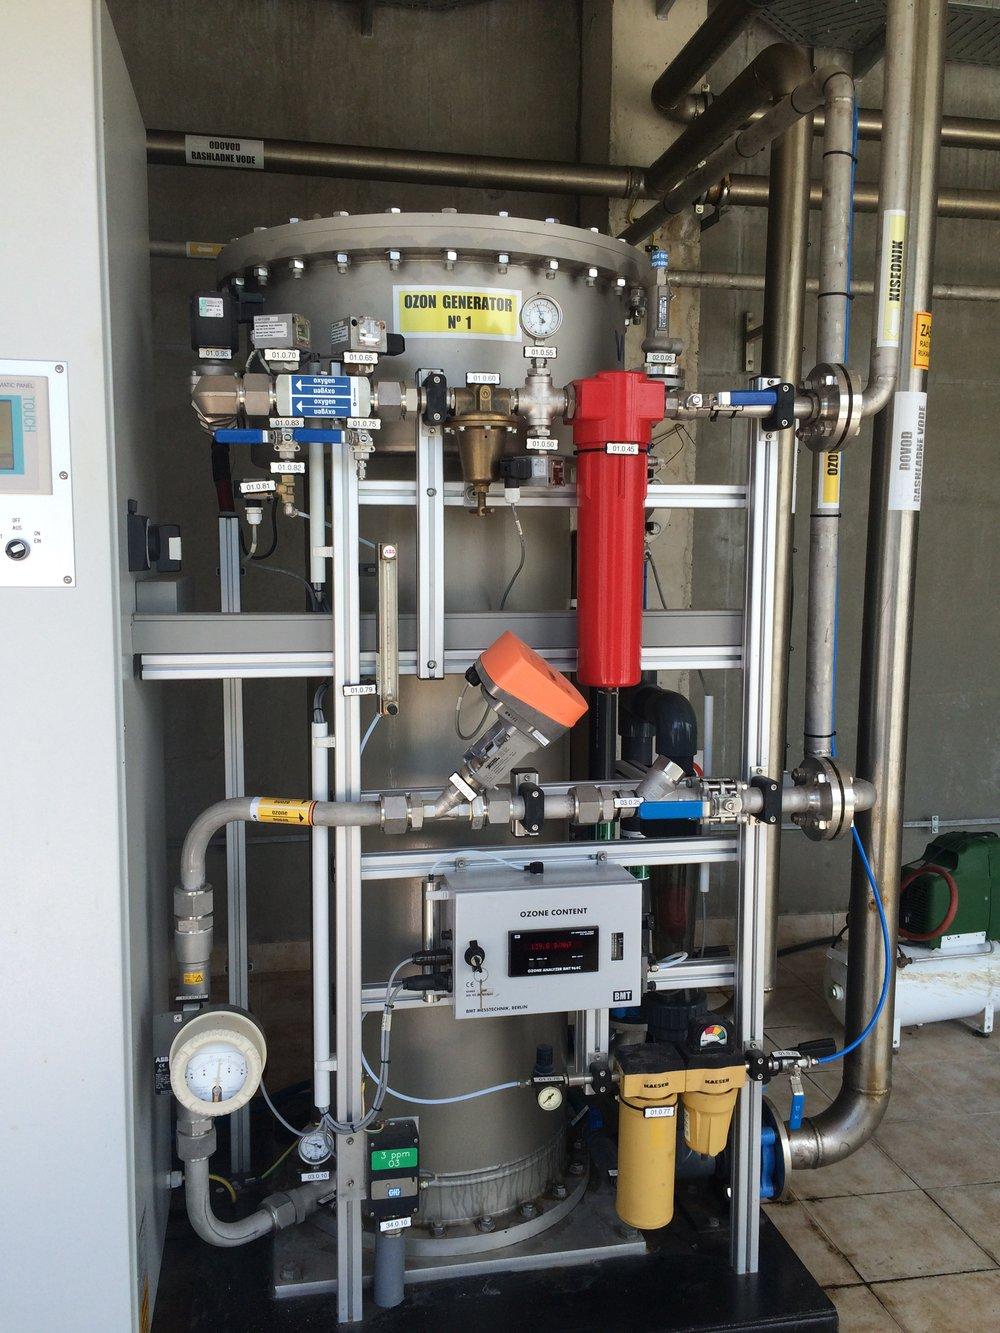 Kraujevac - stari ozon generator (33).JPG